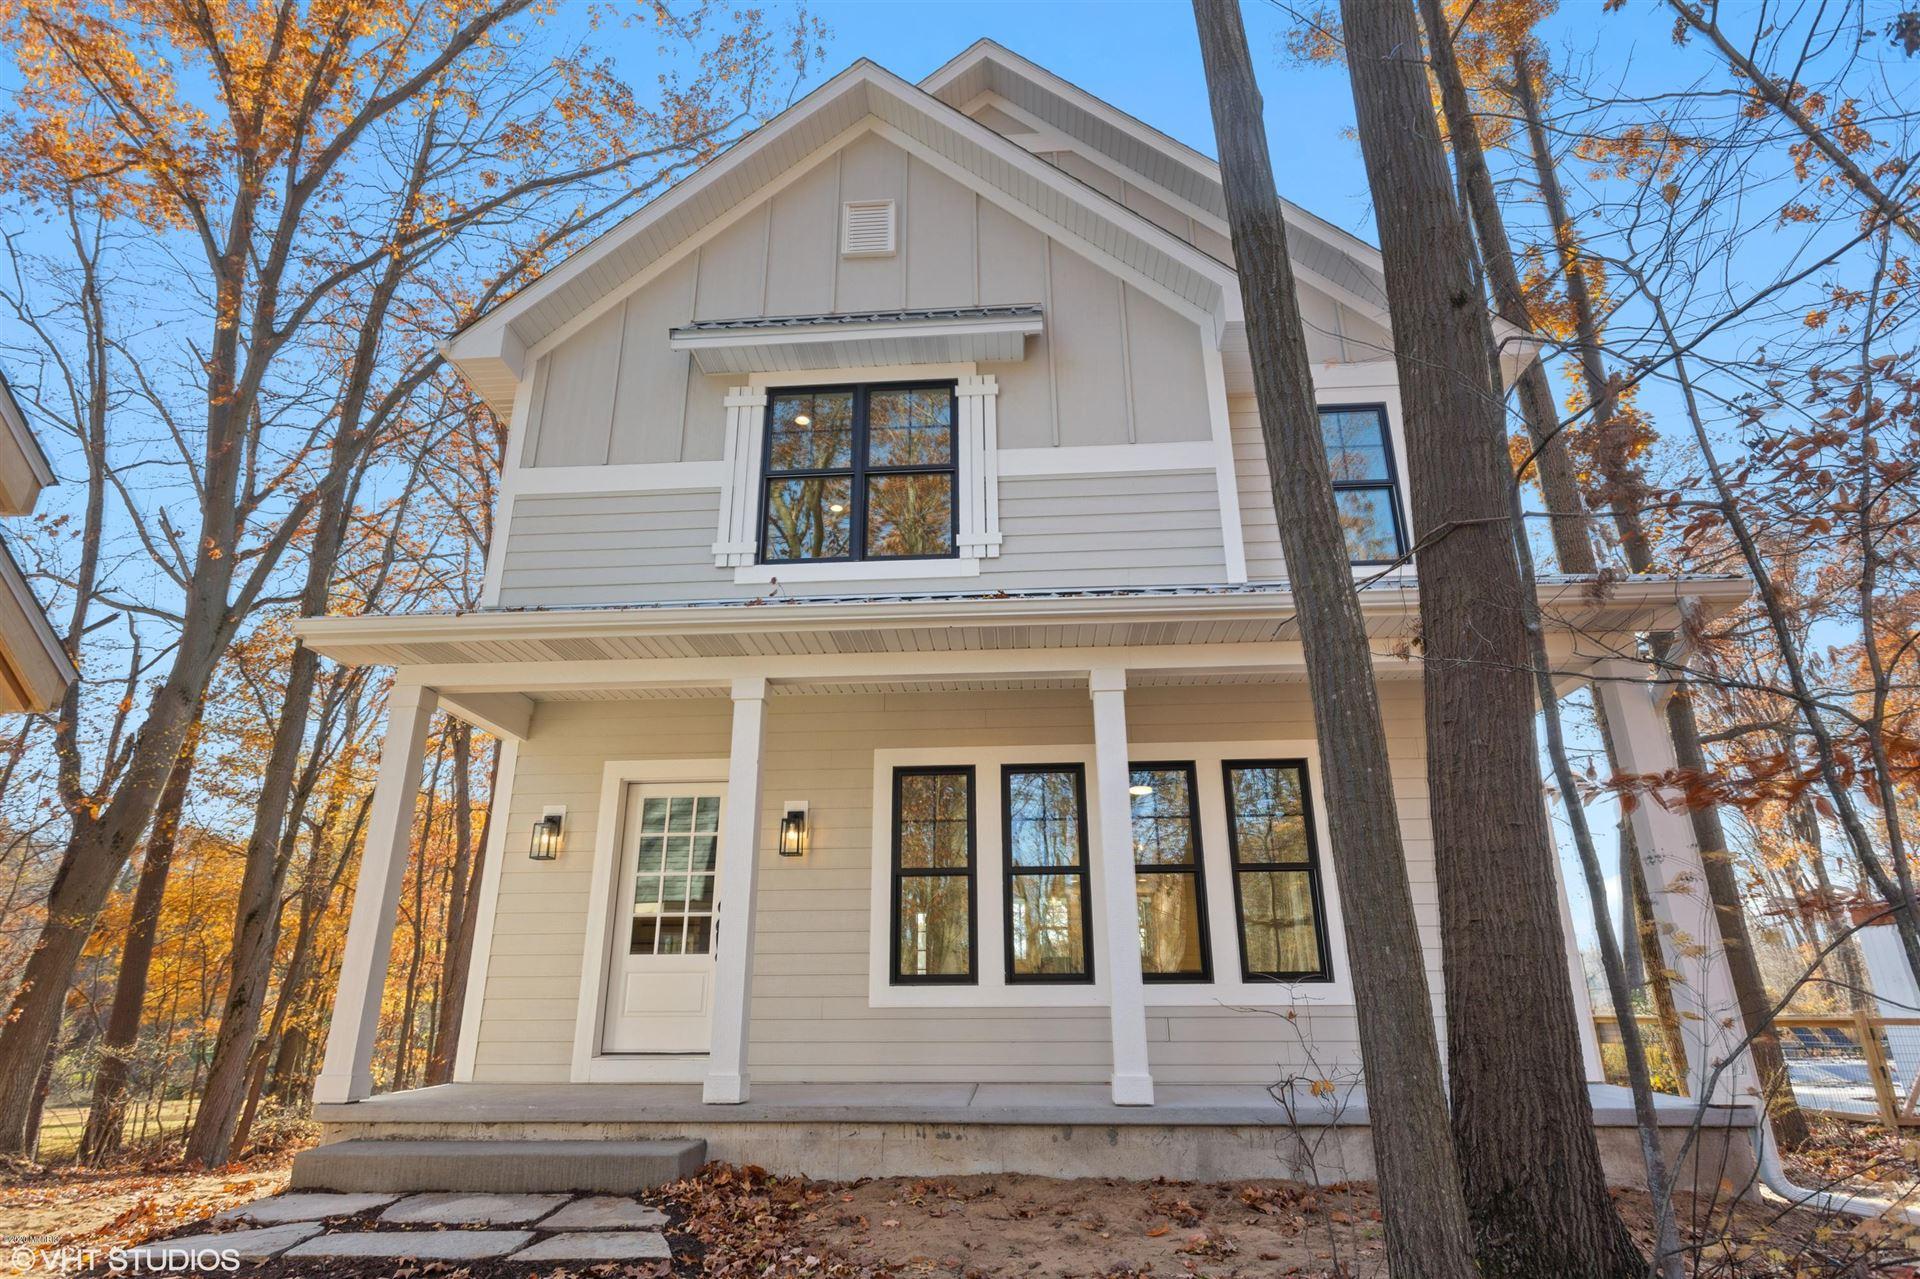 19105 White Pine Drive #7, New Buffalo, MI 49117 - #: 20021021